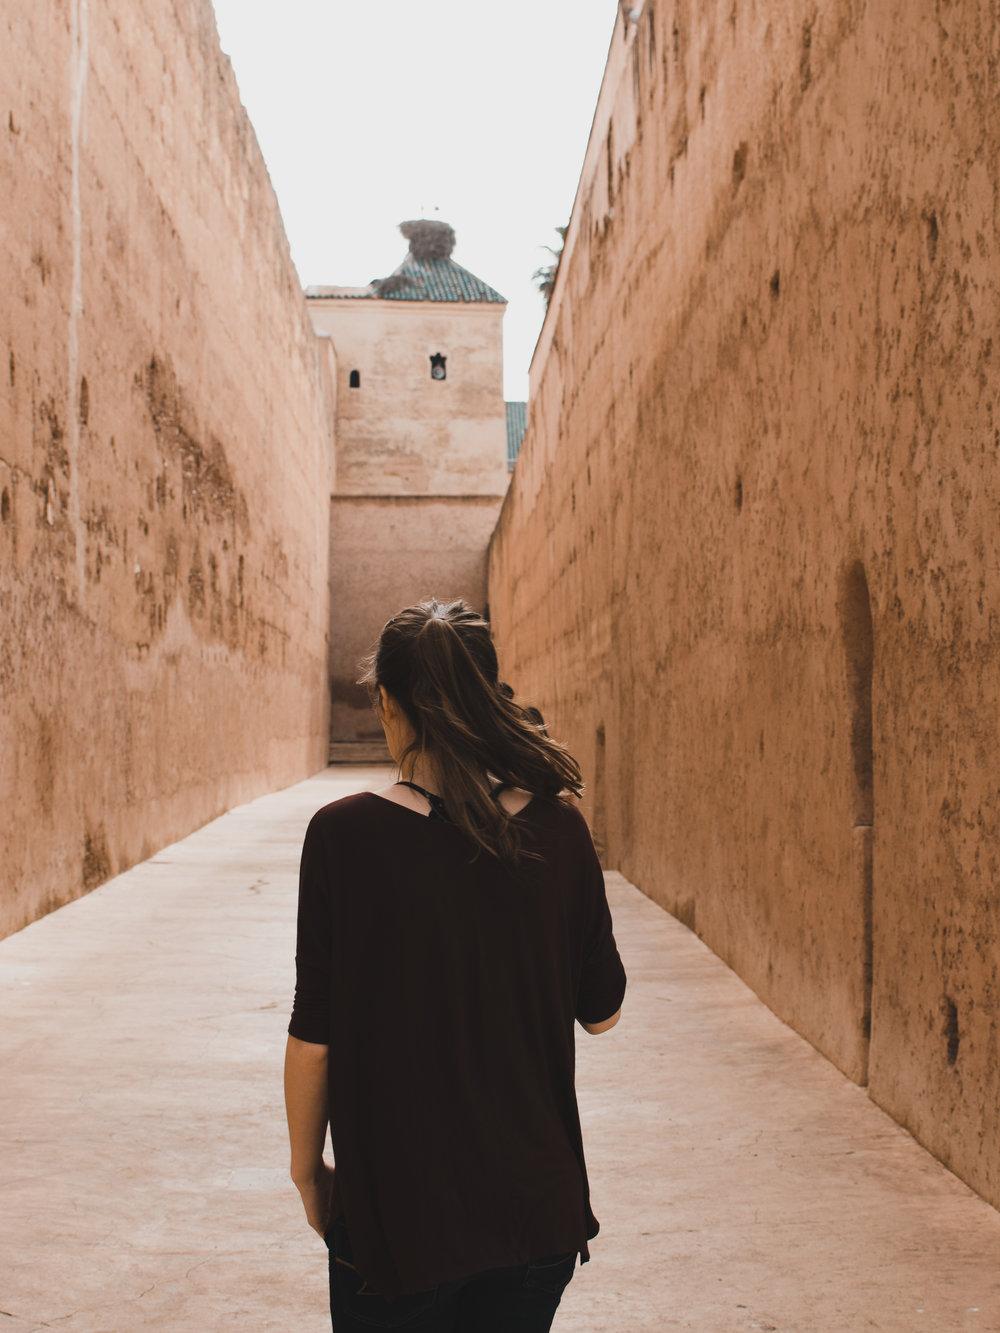 I began my 2 week backpacking trip through Morocco in Marrakech